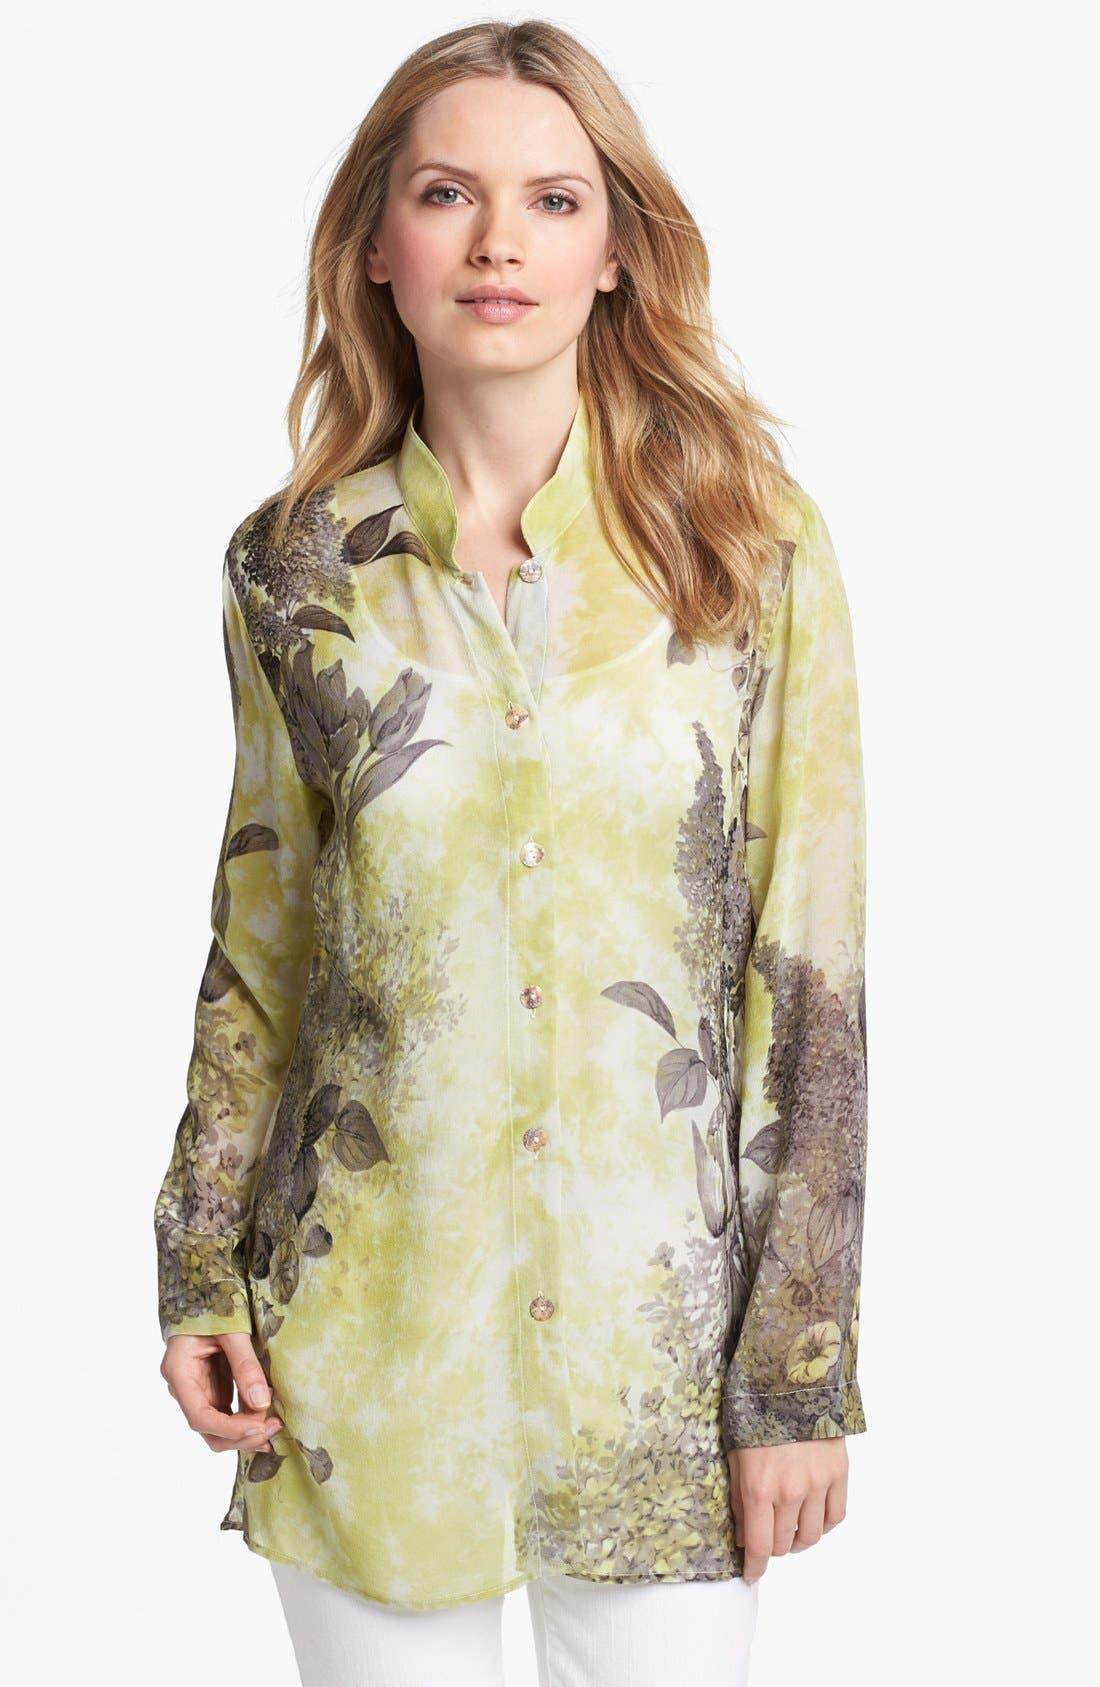 Alternate Image 1 Selected - Citron Mandarin Collar Silk Blouse with Tank